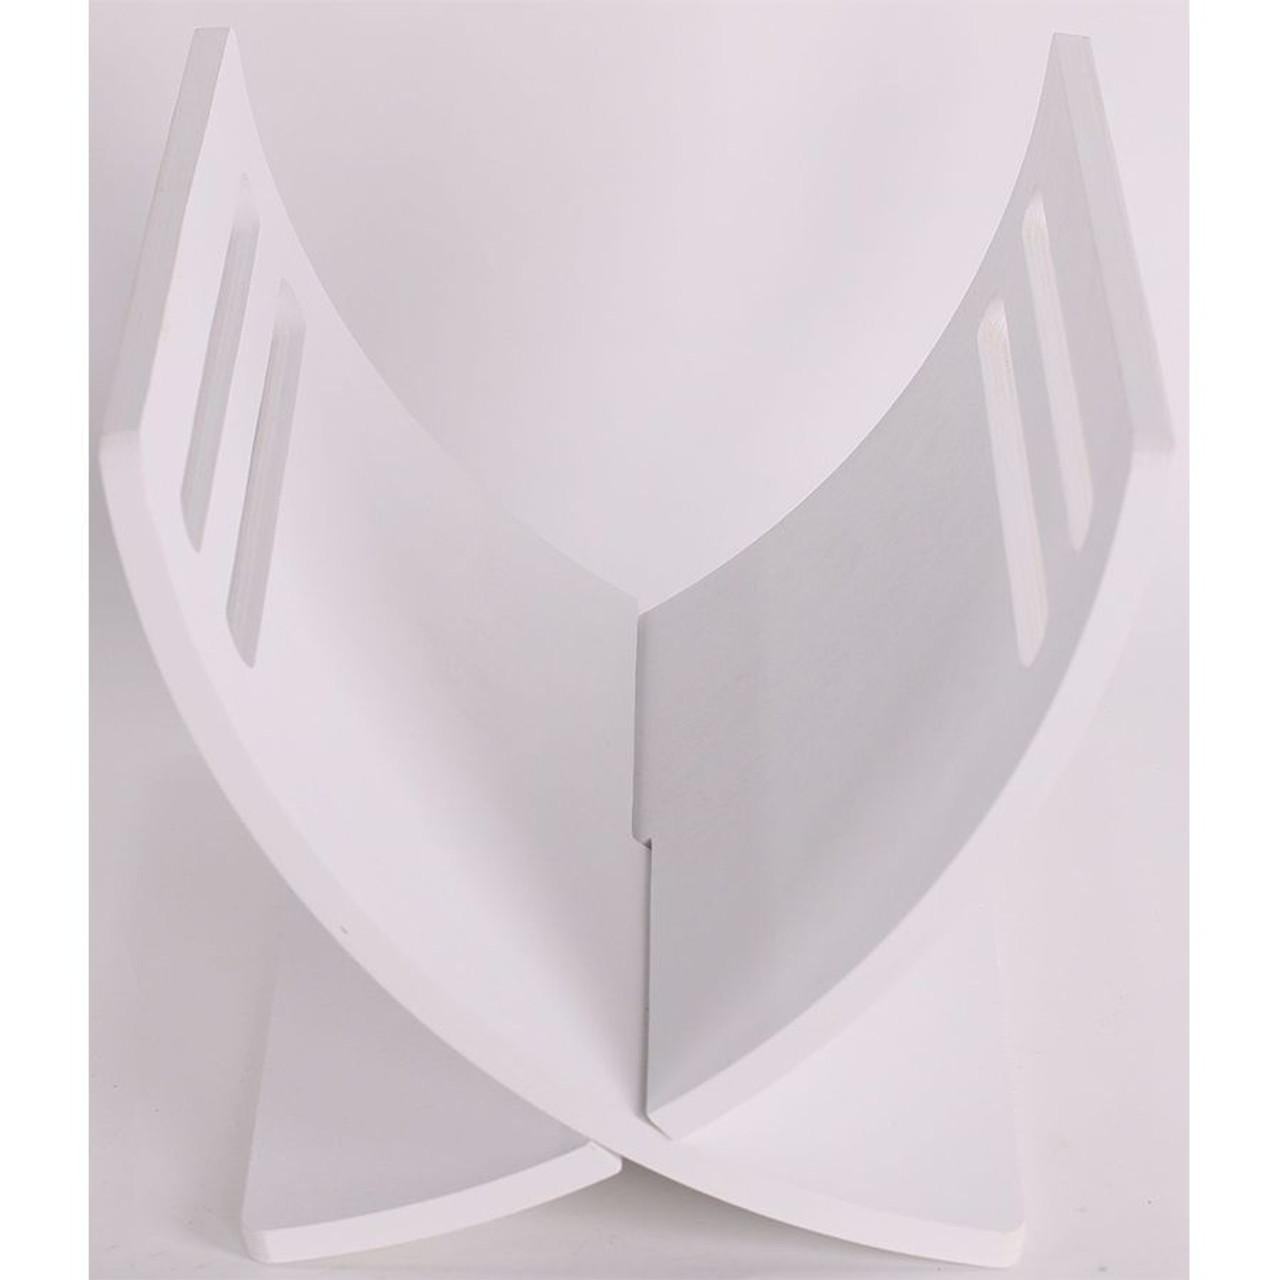 Solid Wood Magazine Holder, White Color